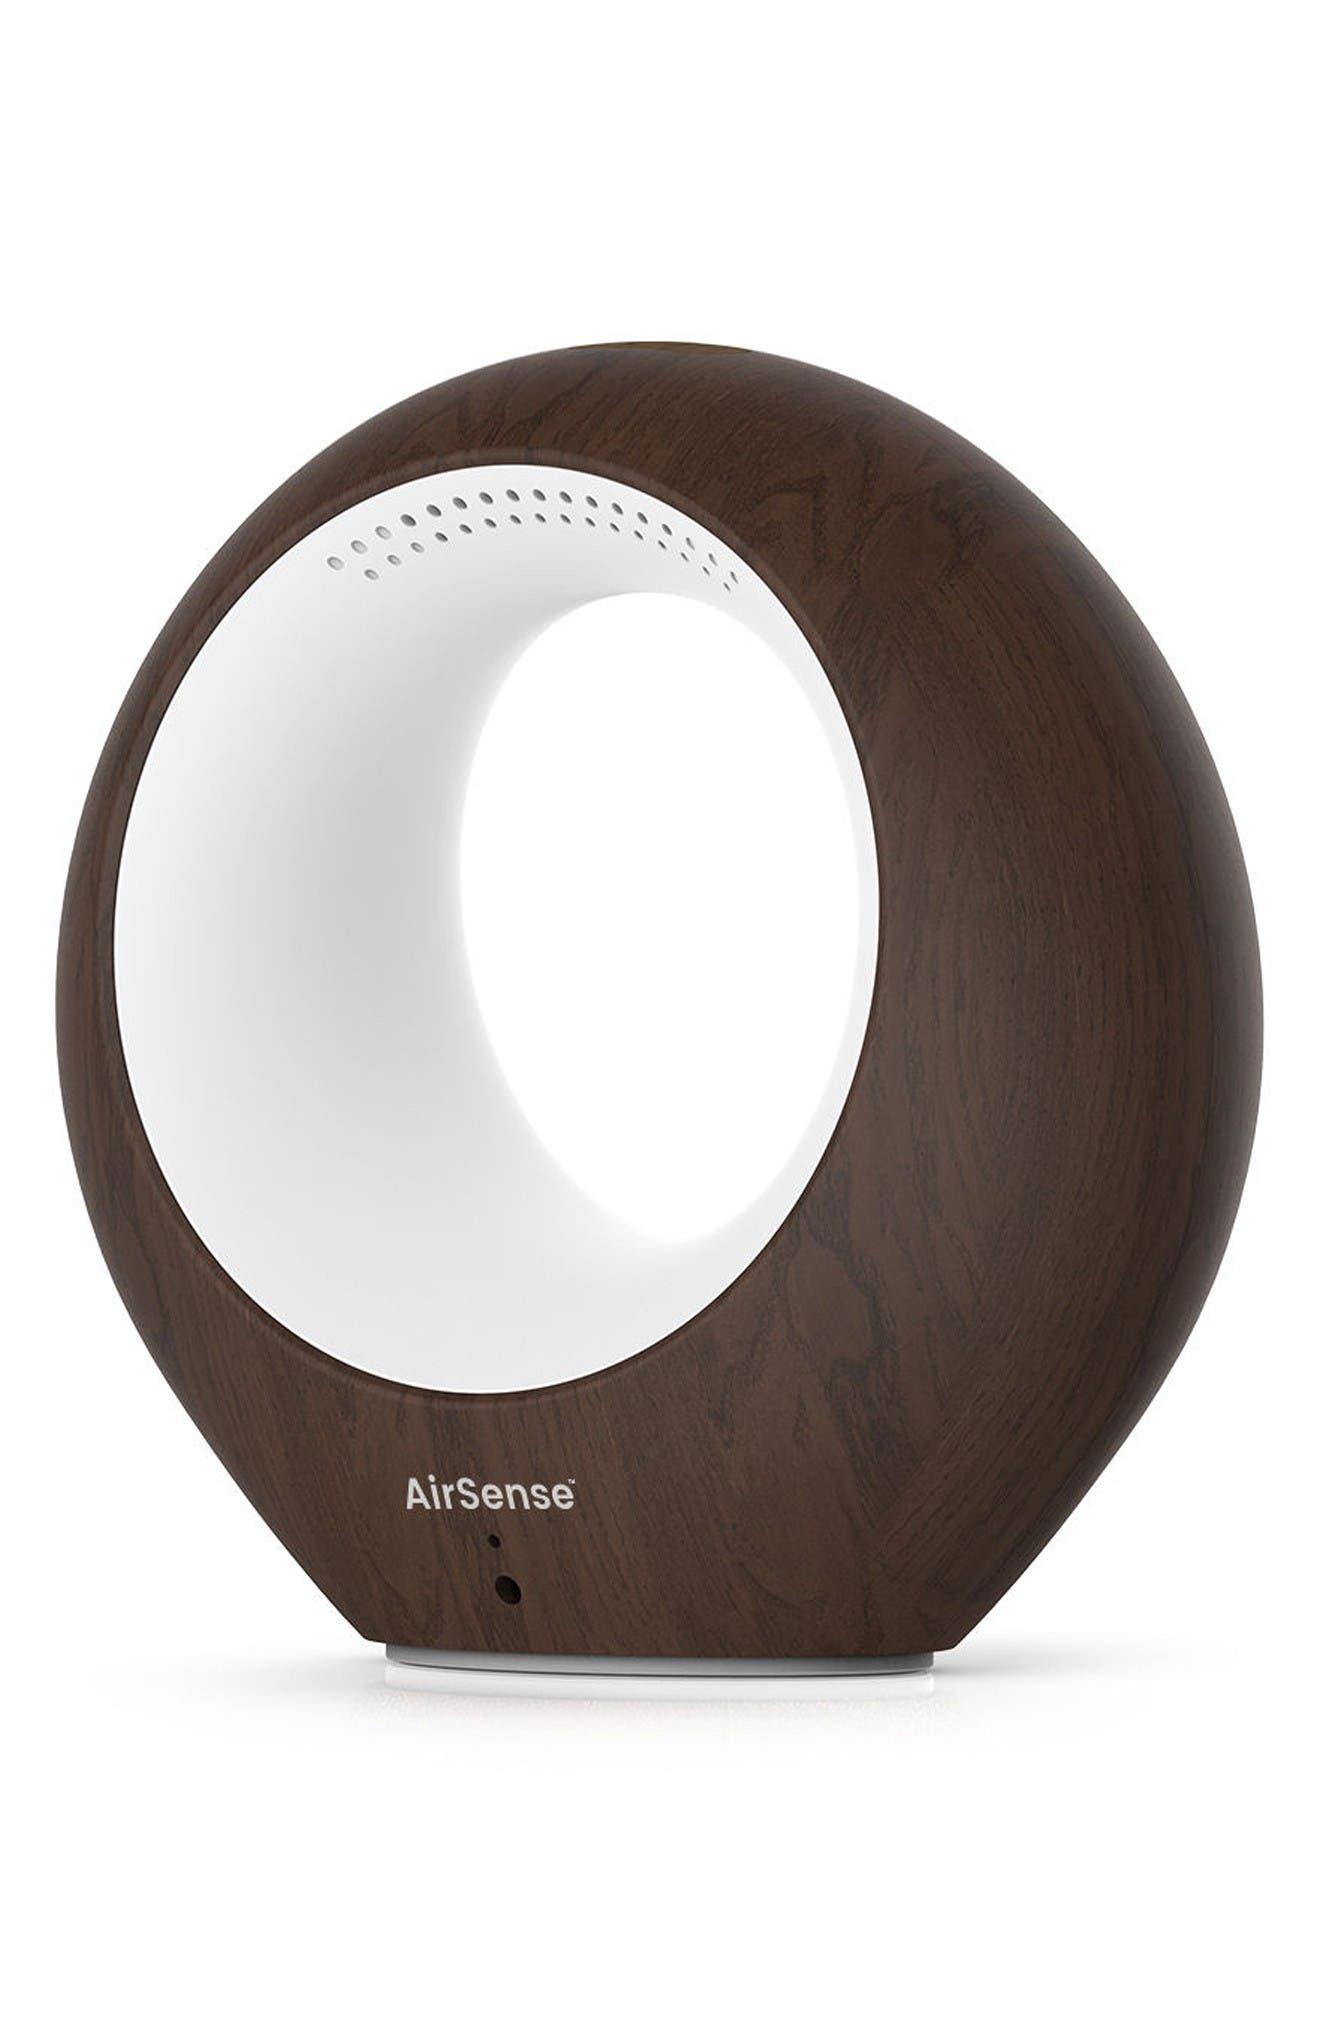 iBaby AirSense Air Purifier